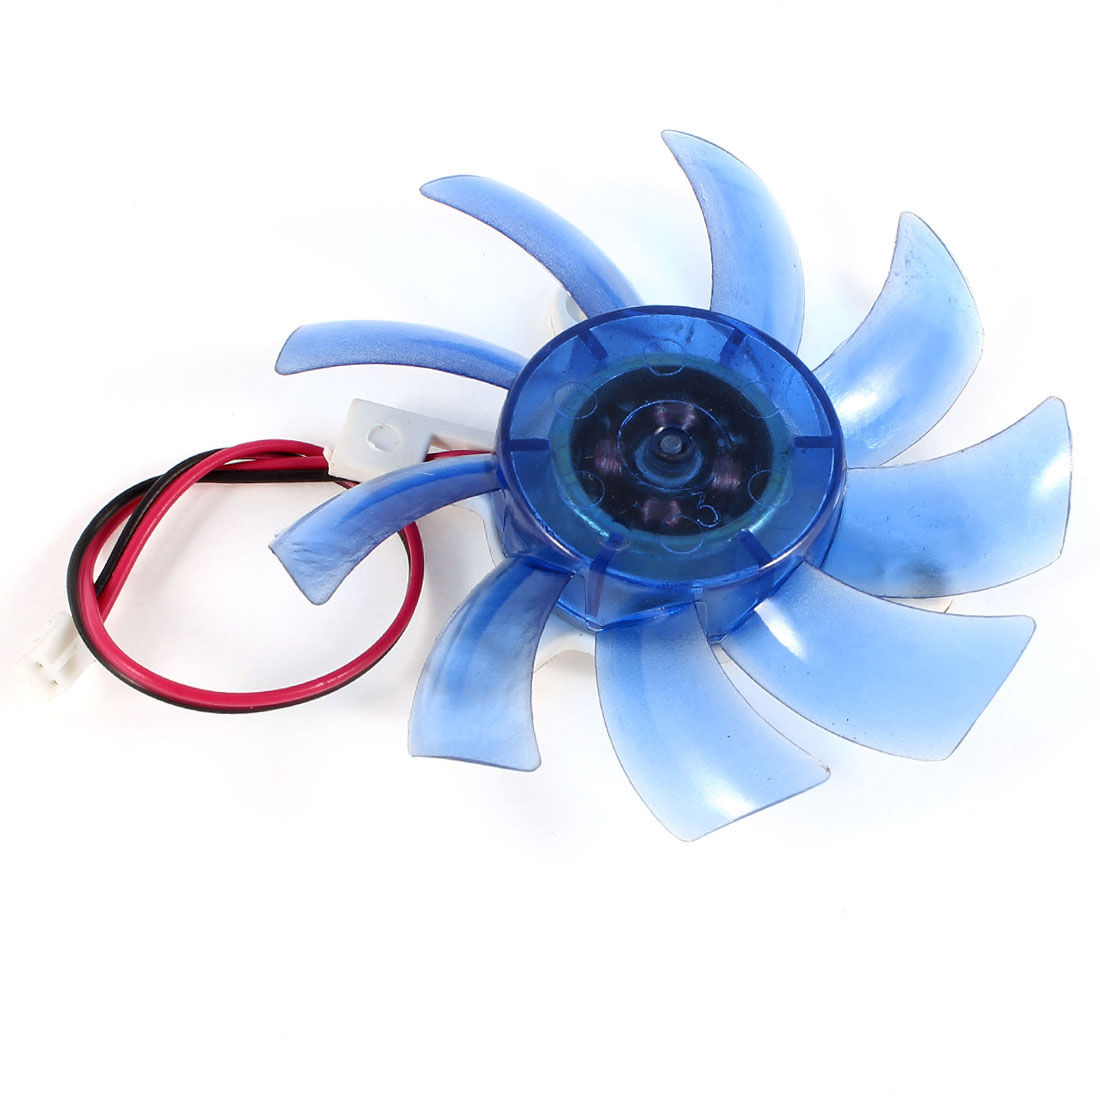 75mm 12VDC Blue Plastic VGA Video Card Cooling Fan Cooler for Computer